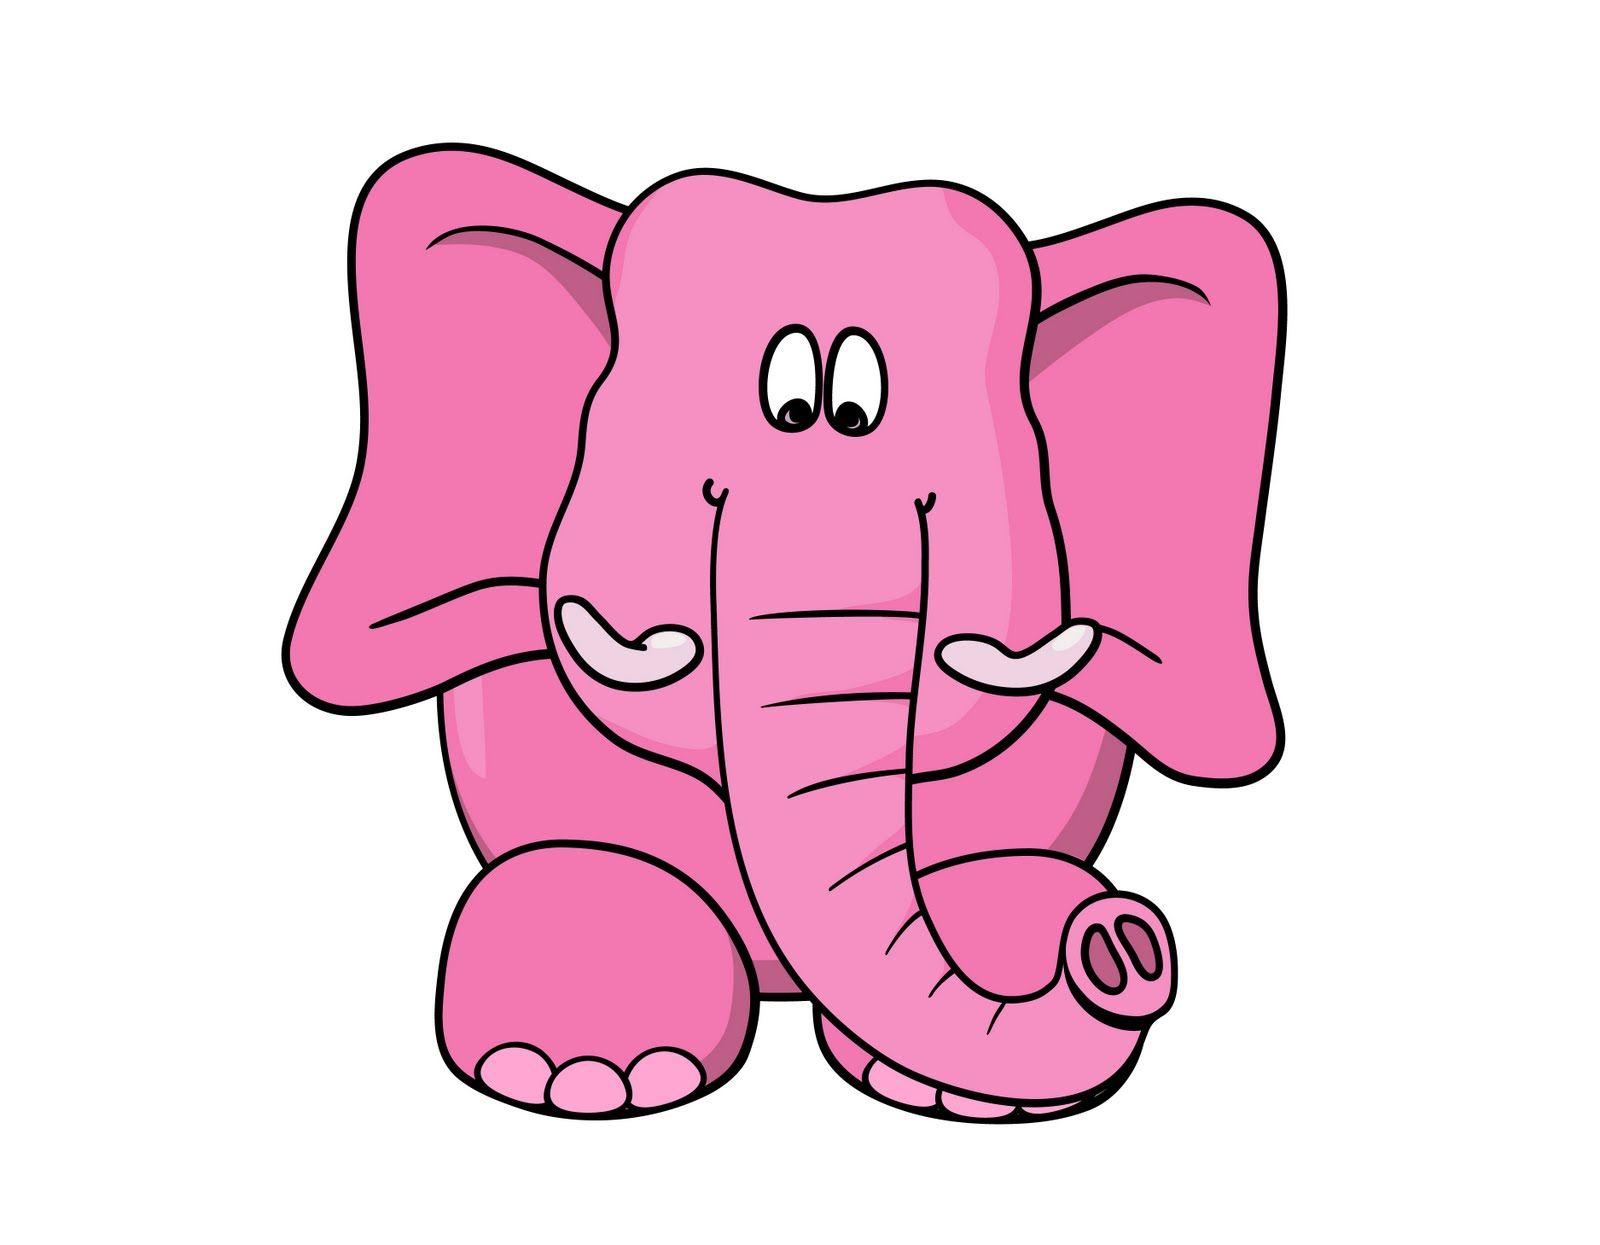 Top Wallpaper Cartoon Elephant - 204692b35531bf11b41c101e9956dc9f  Best Photo Reference_699479  .jpg